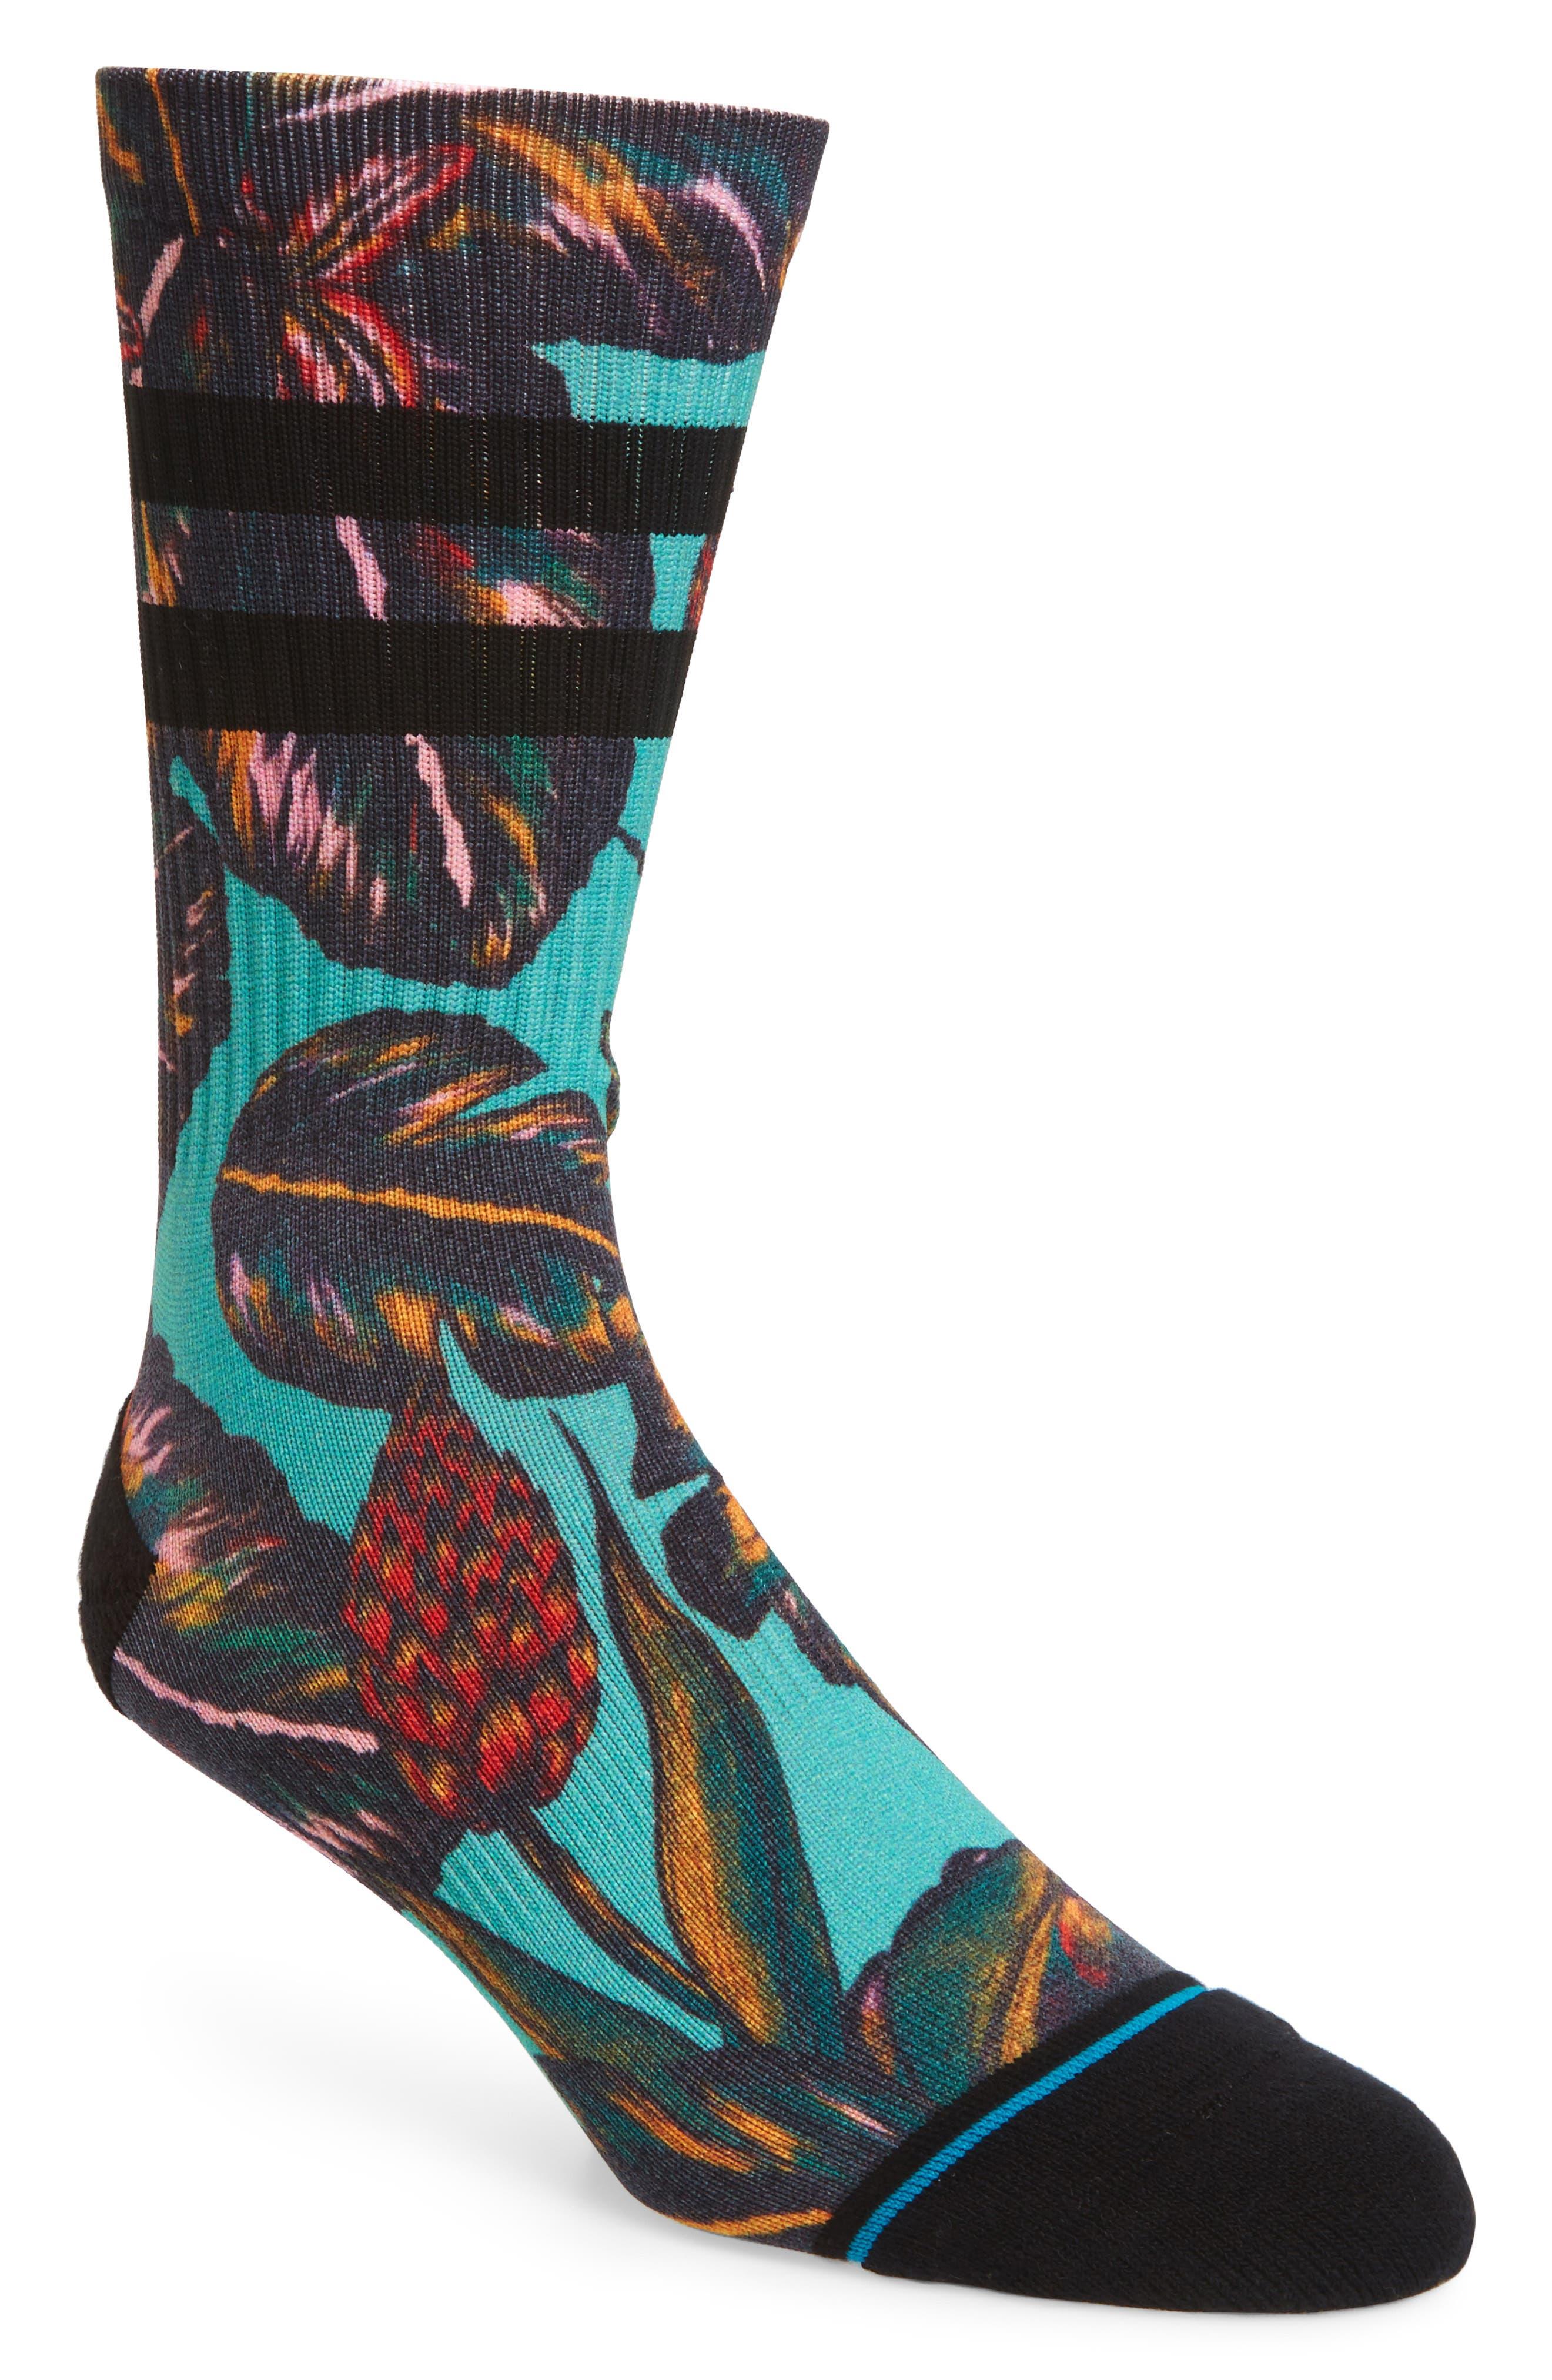 Sleeping Giant Socks,                         Main,                         color, Blue Multi